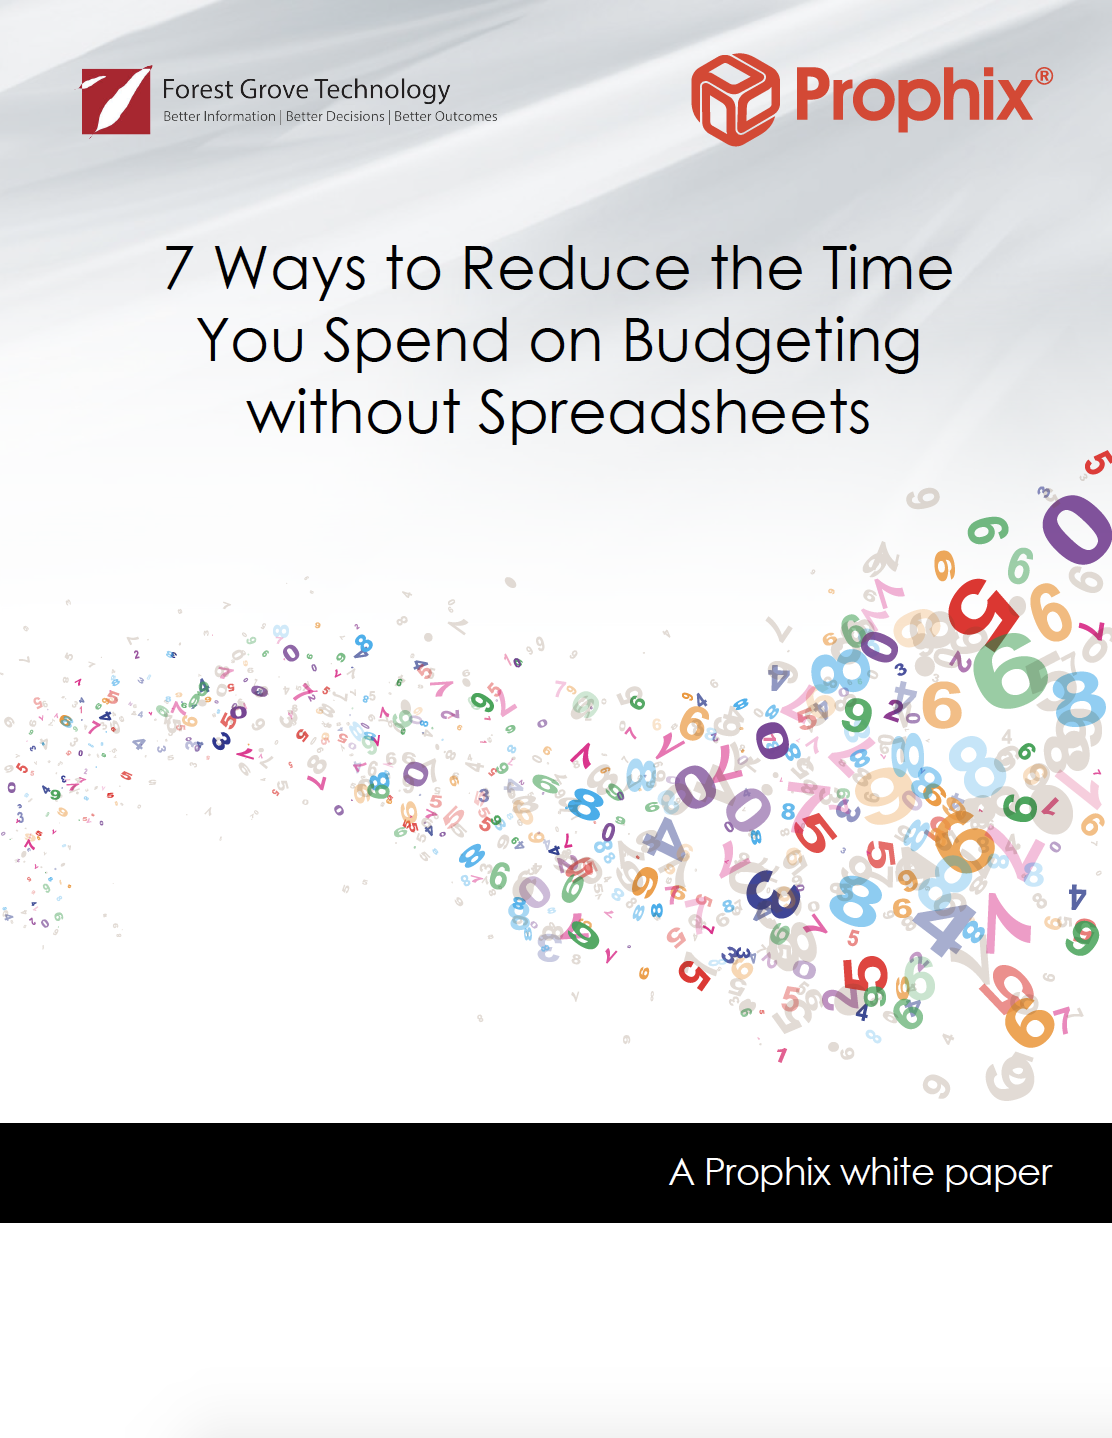 Prophix Budgeting White Paper